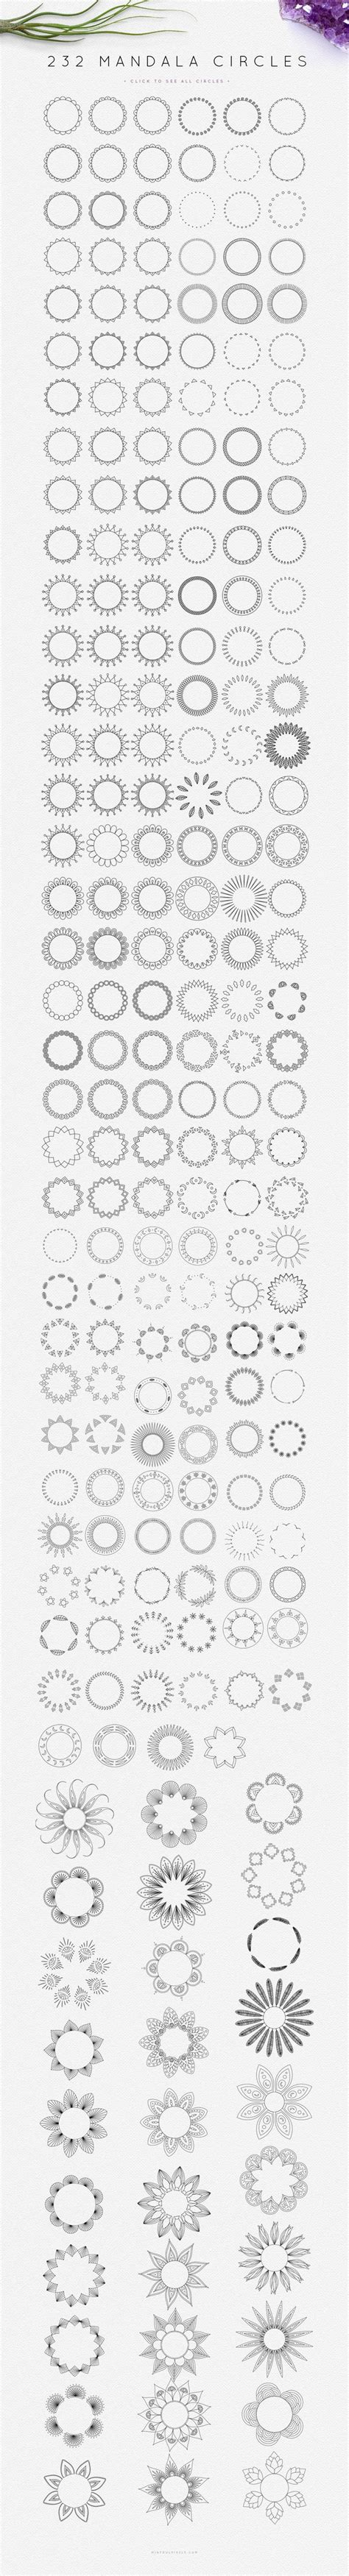 doodle logo maker 25 b 228 sta id 233 erna om mandala doodle p 229 mandala